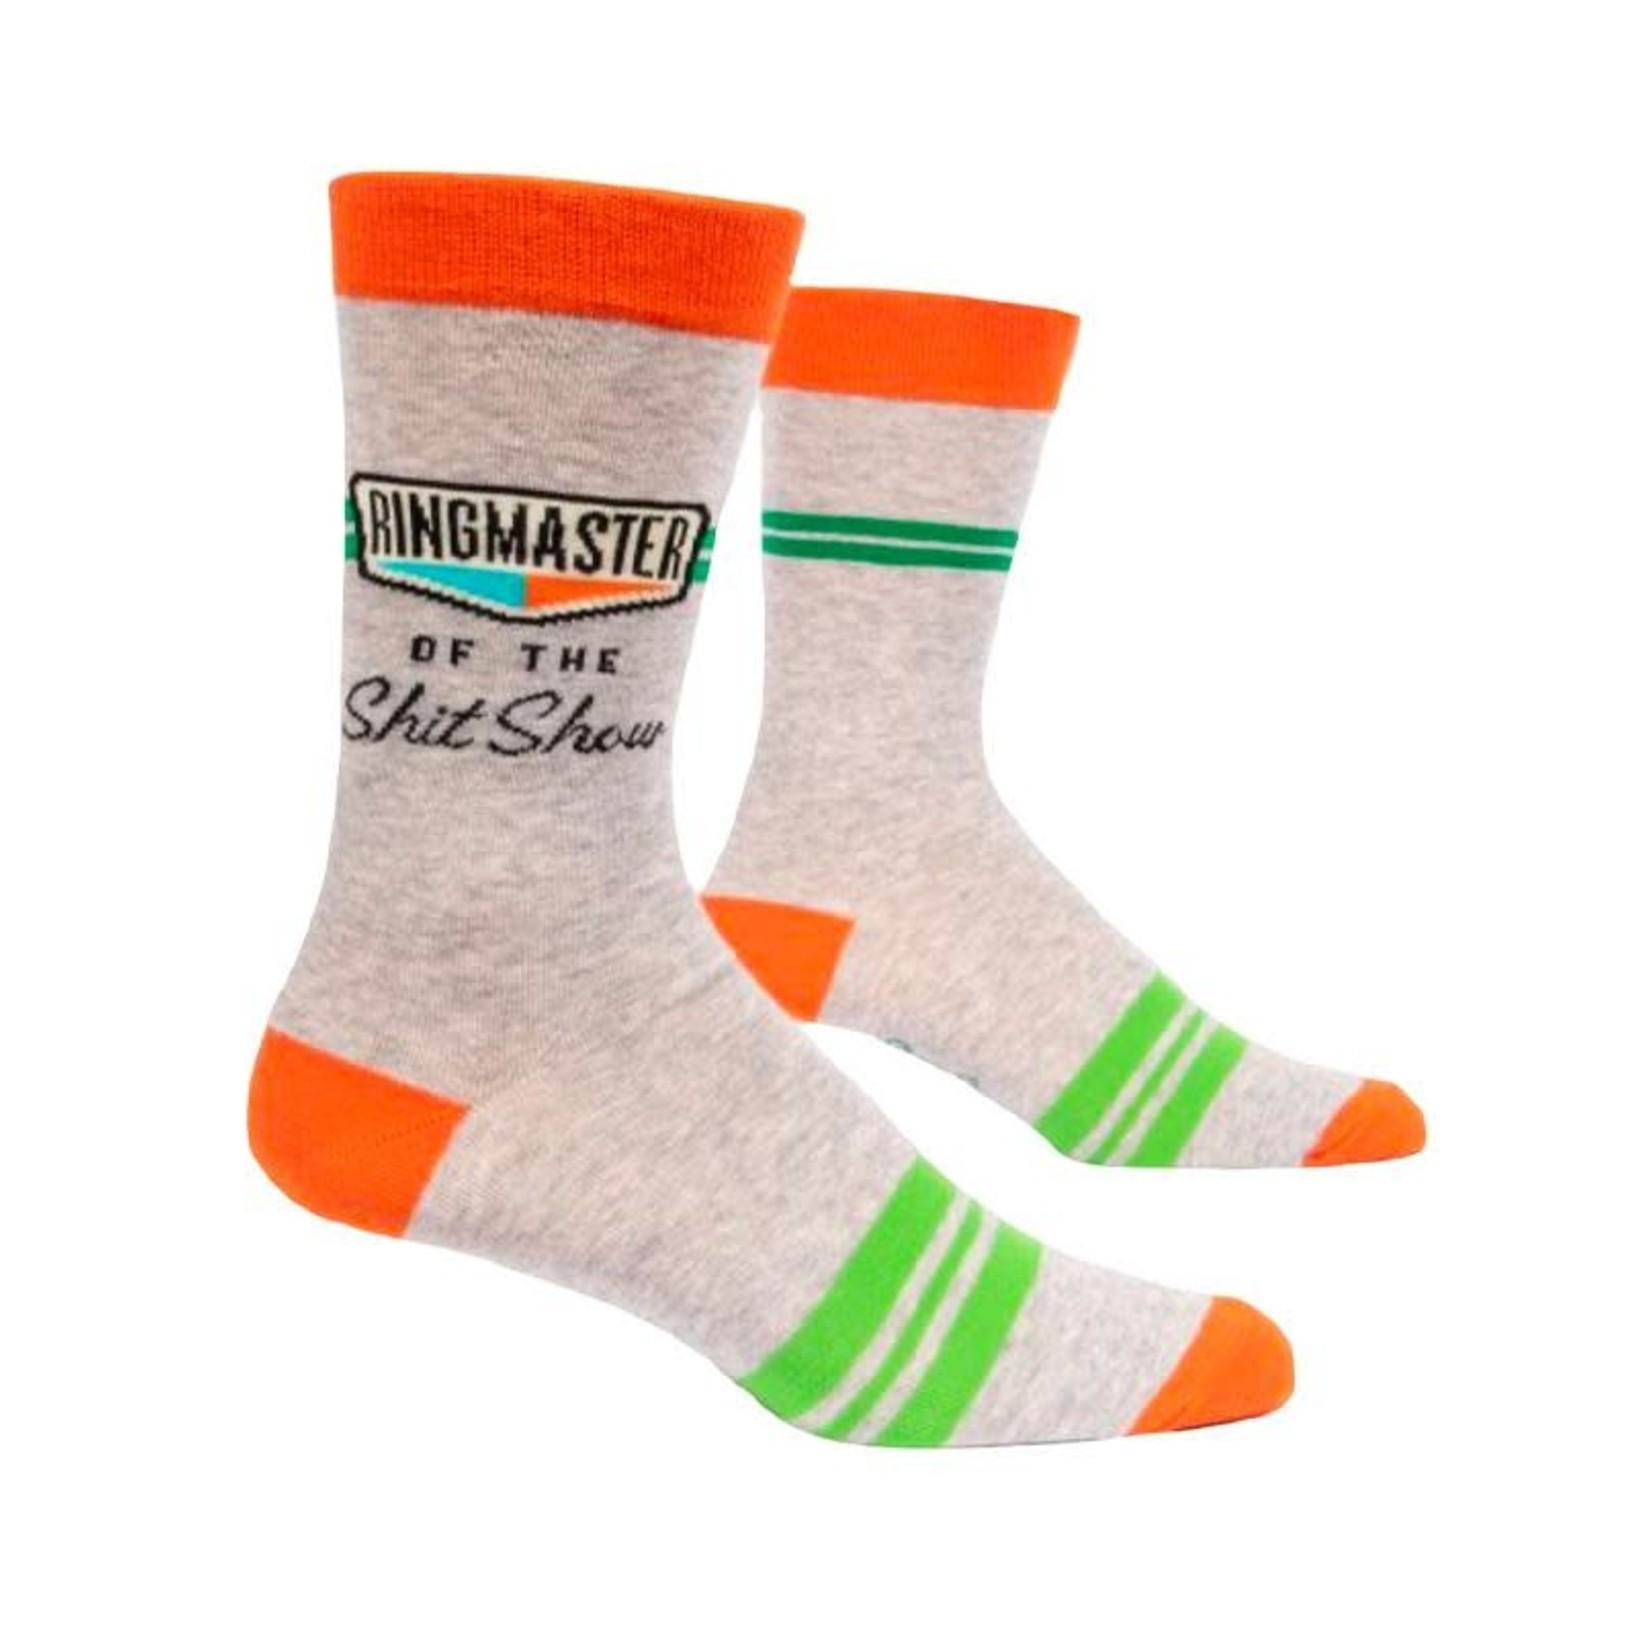 Socks (Mens) - Ringmaster Of The Shitshow